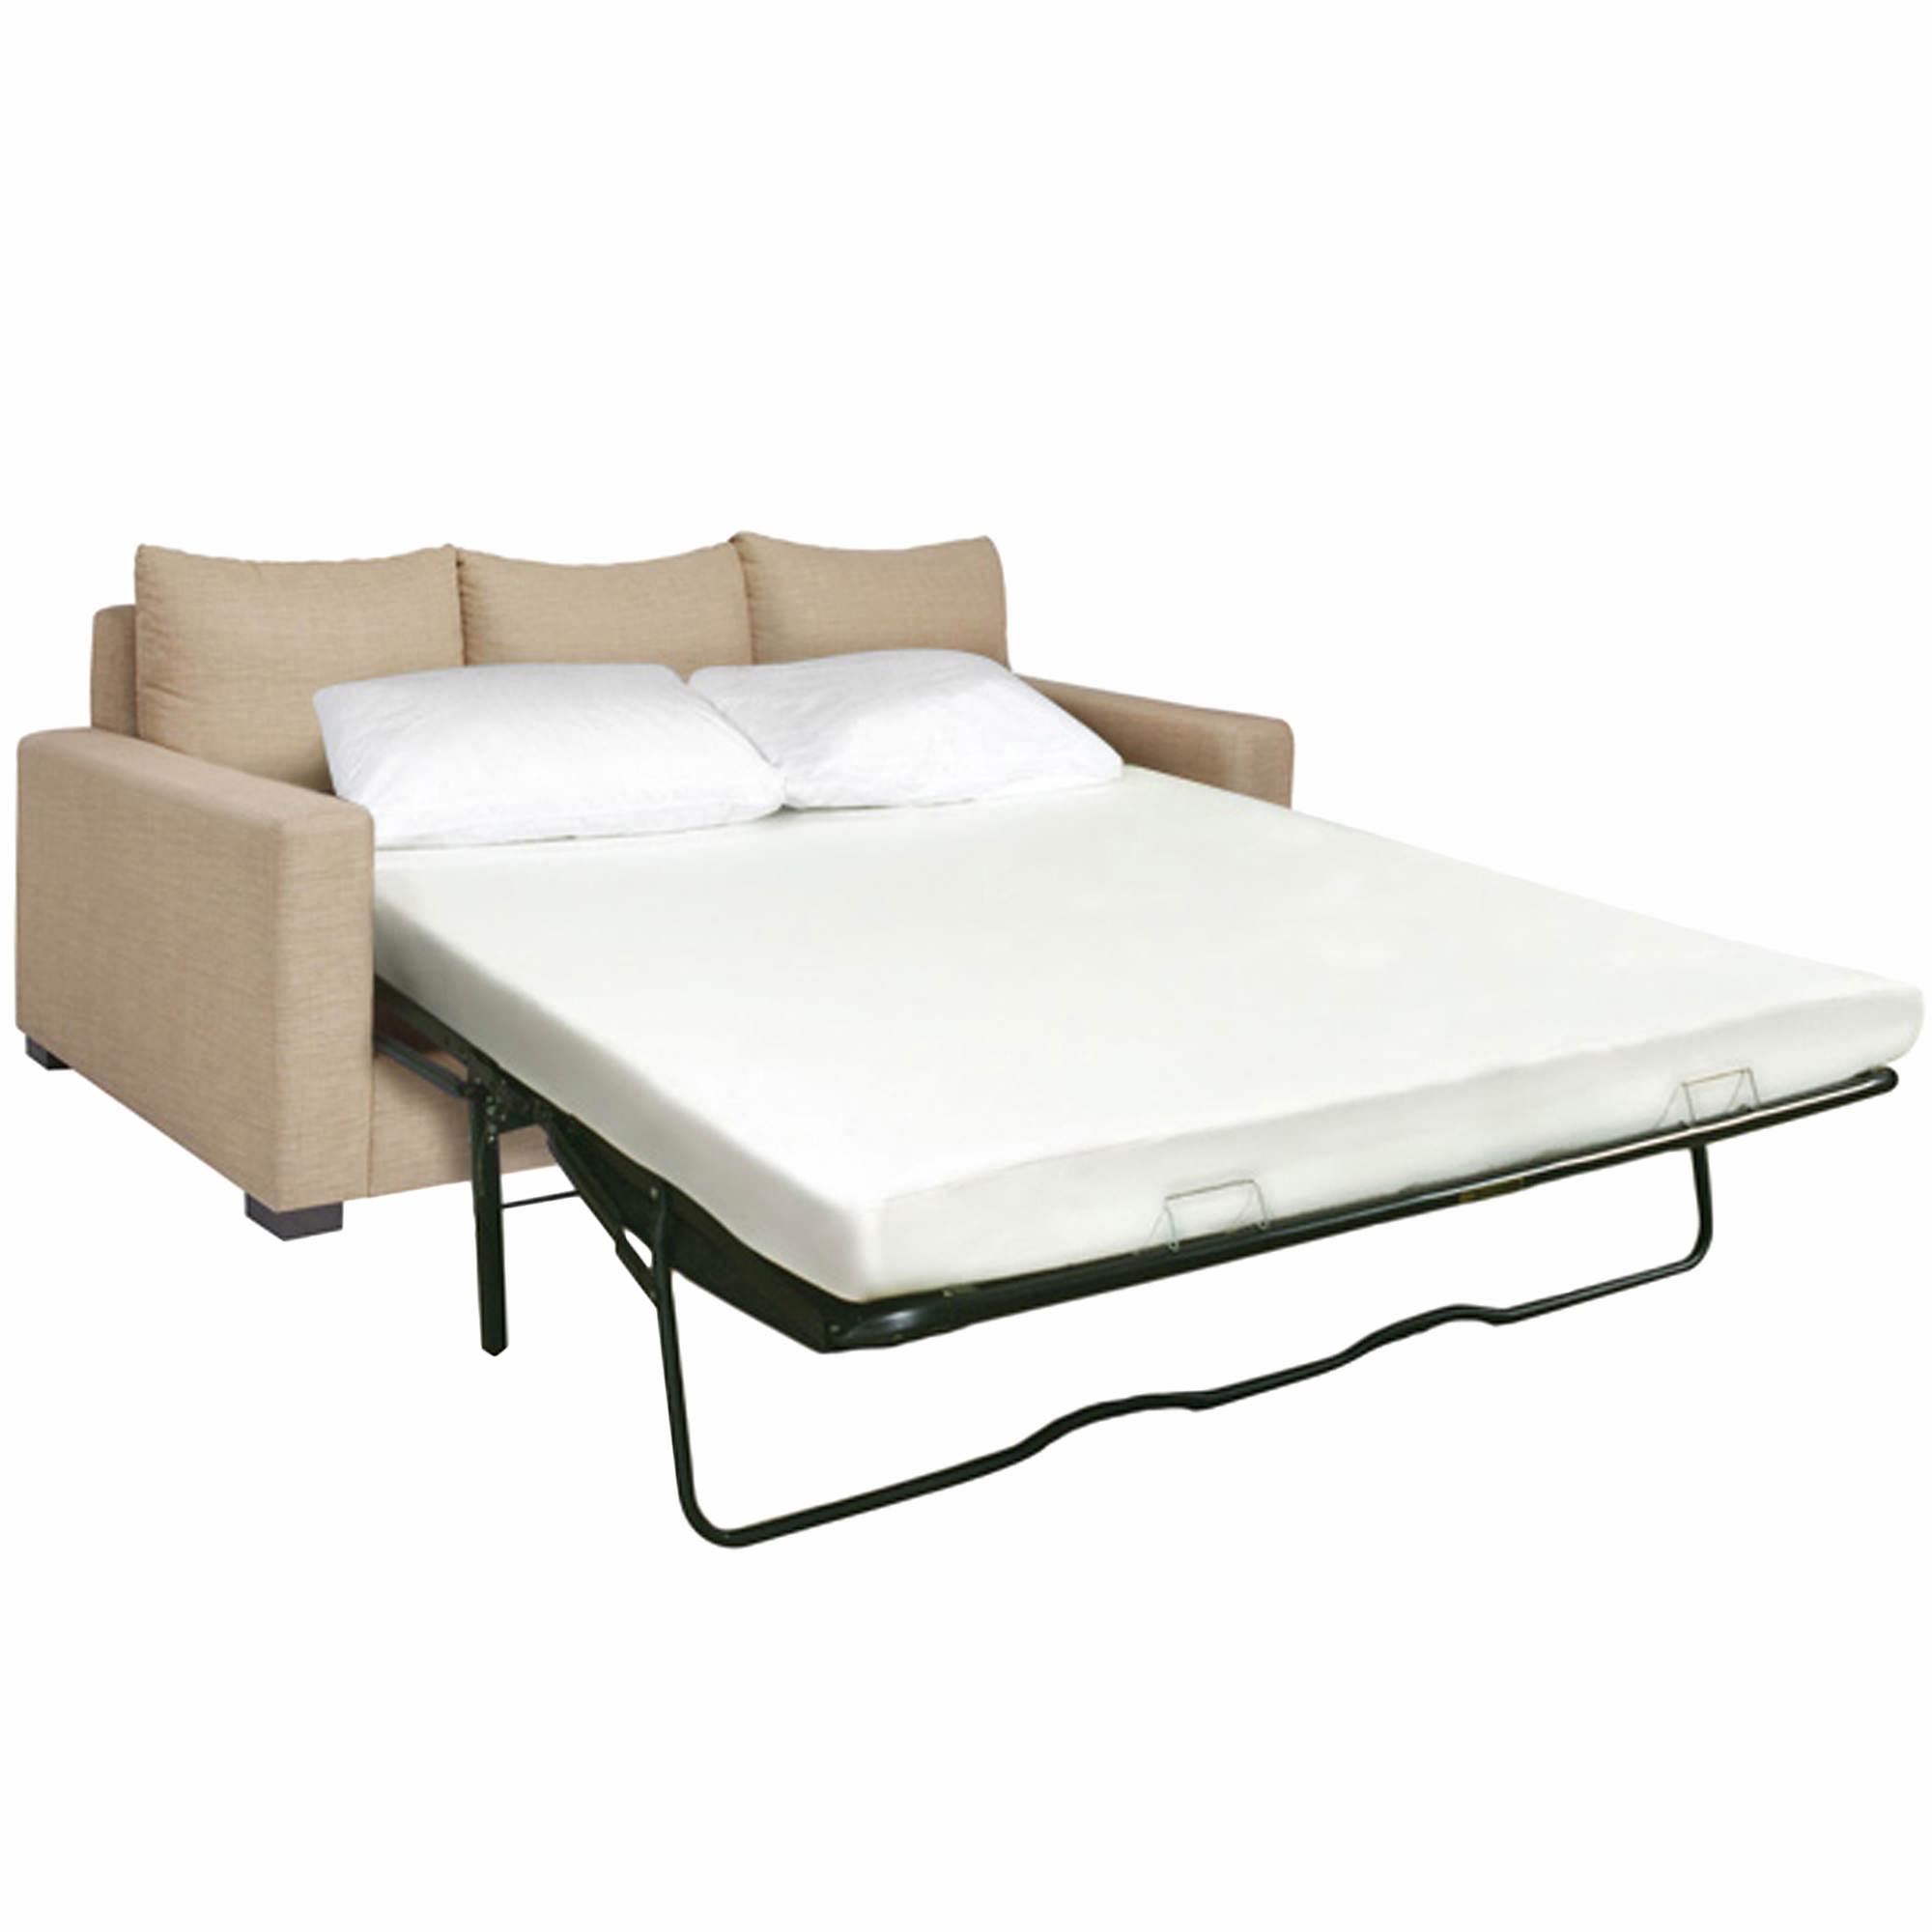 Replacement Sleeper Sofa Mattress: Cradlesoft Axiom I Twin-Size Sleep Sofa Replacement